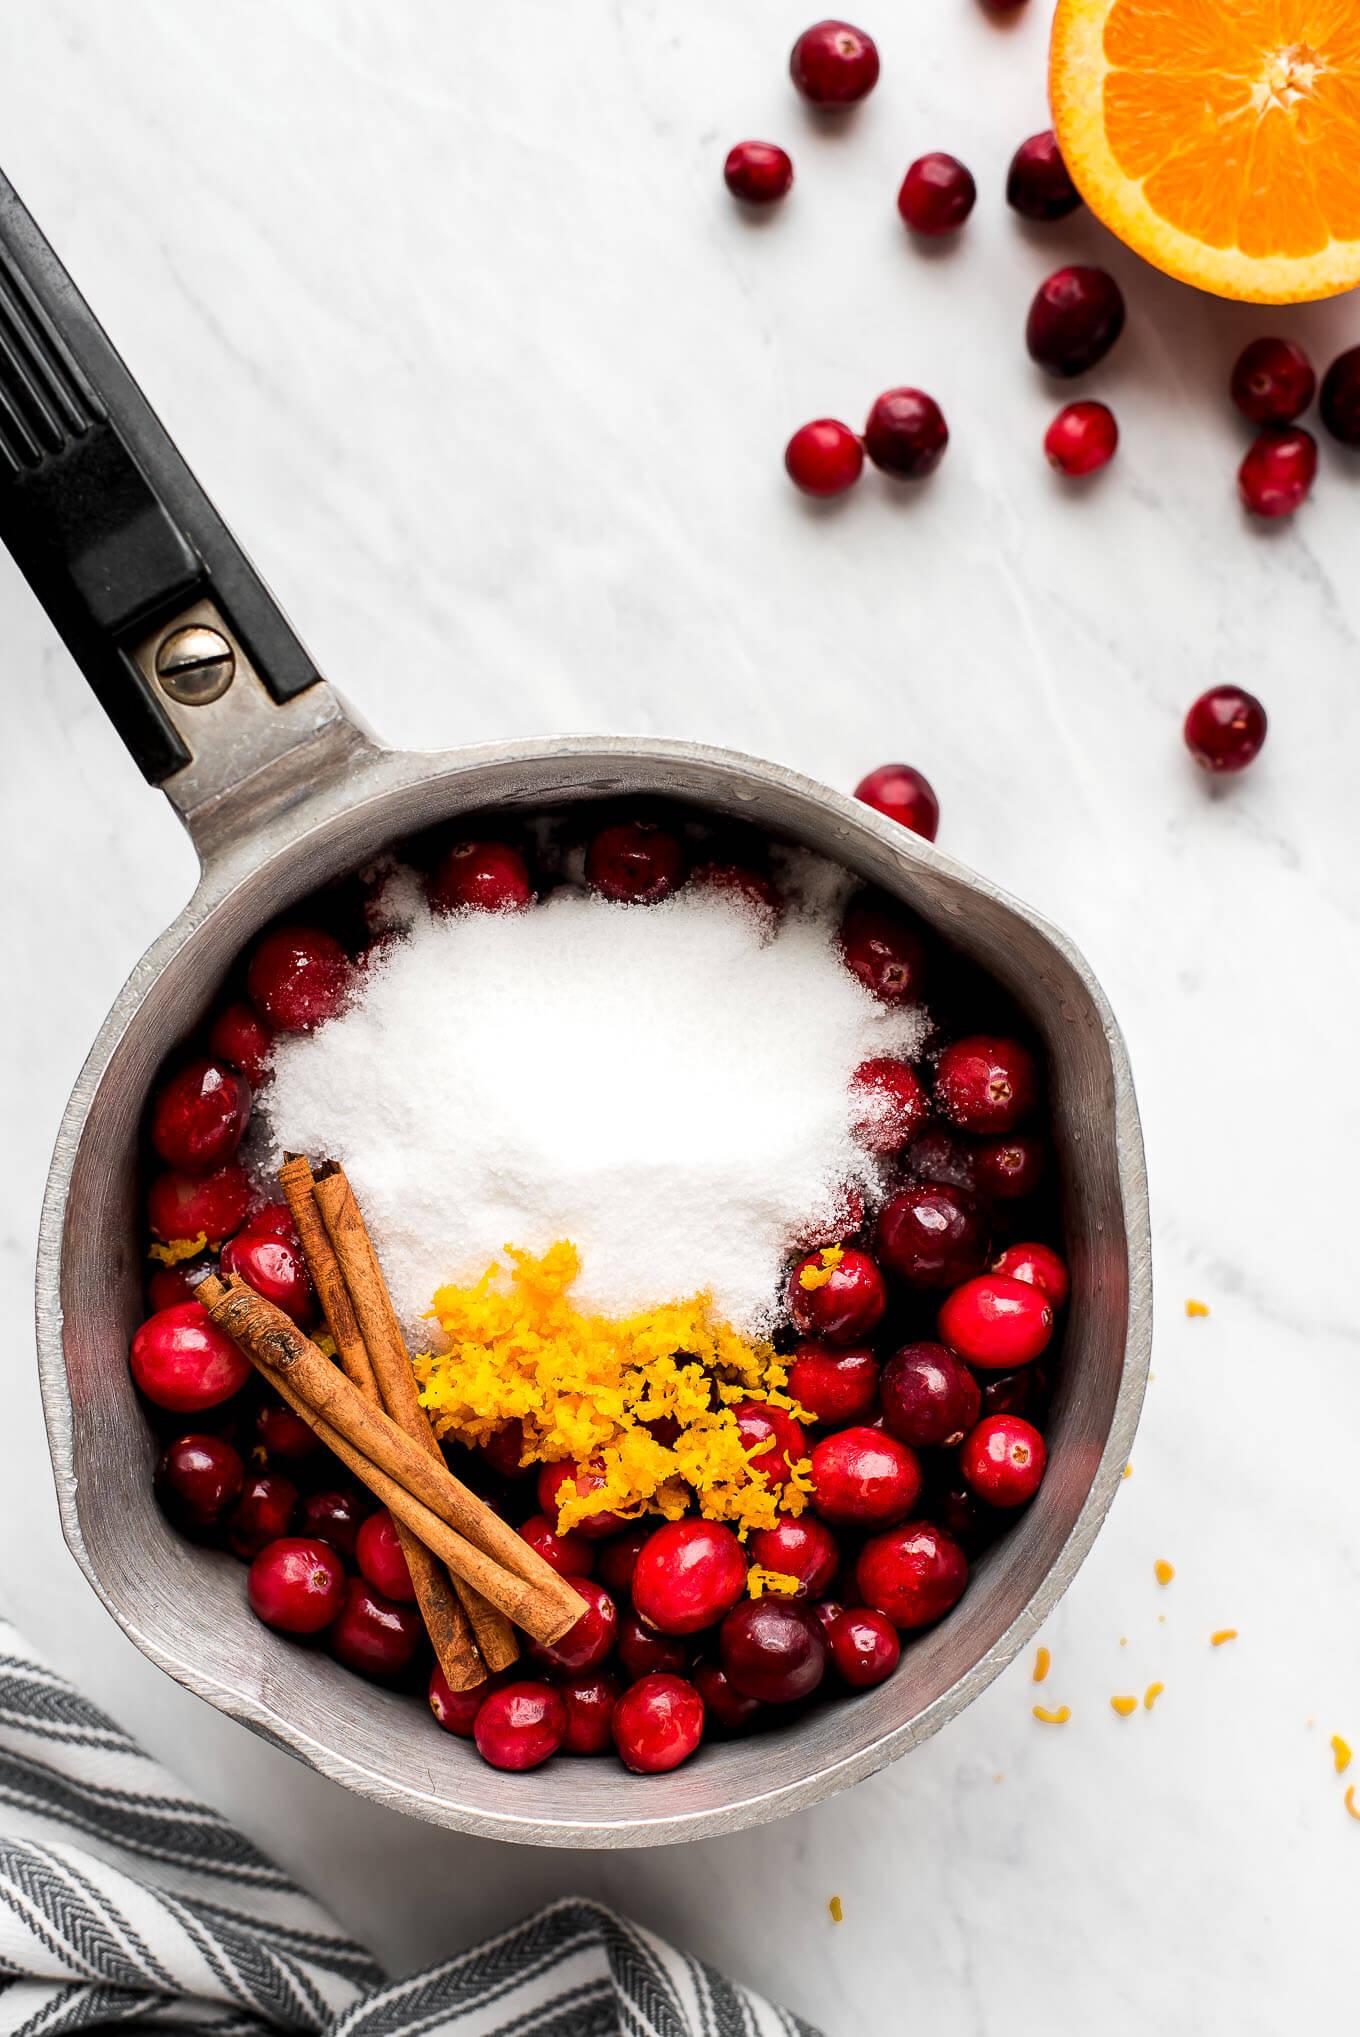 Cranberries, sugar, orange zest, and cinnamon sticks in a pot.